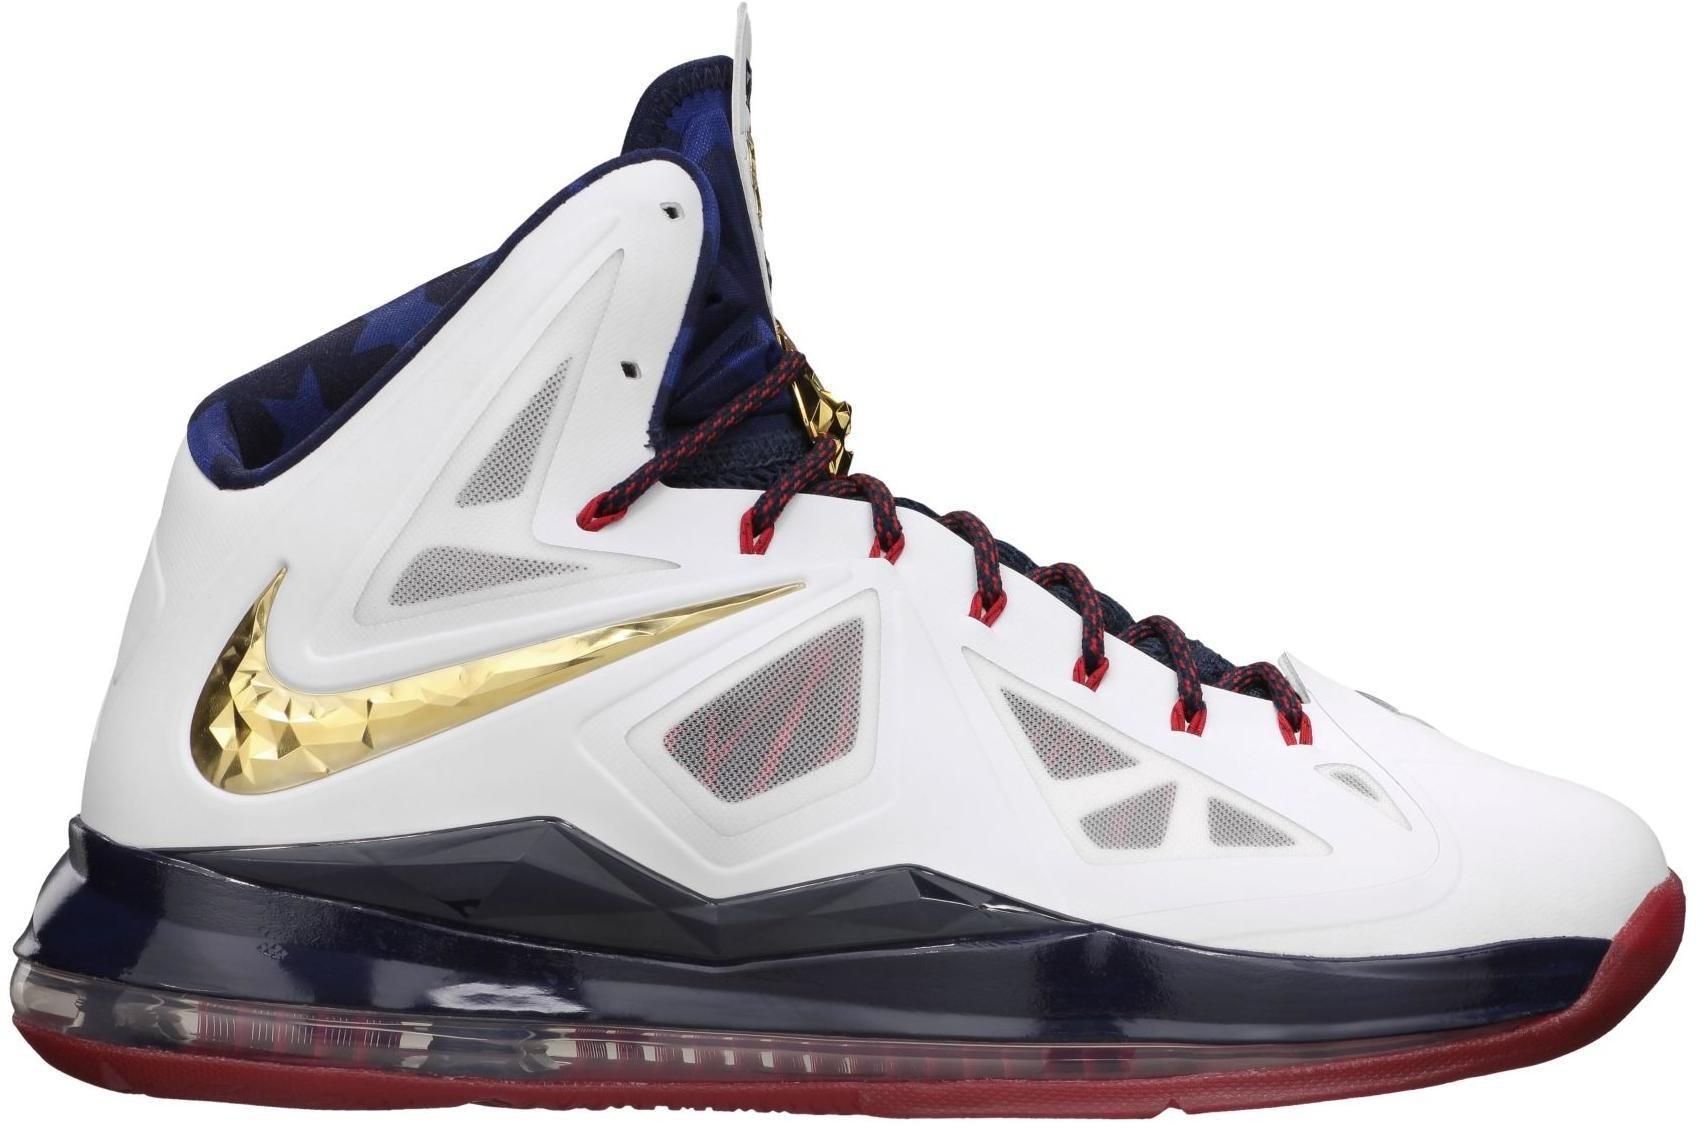 size 40 4430d e36f9 Nike Sb Unkle Size 9 Nike Sb Black Pigeon Retail Price